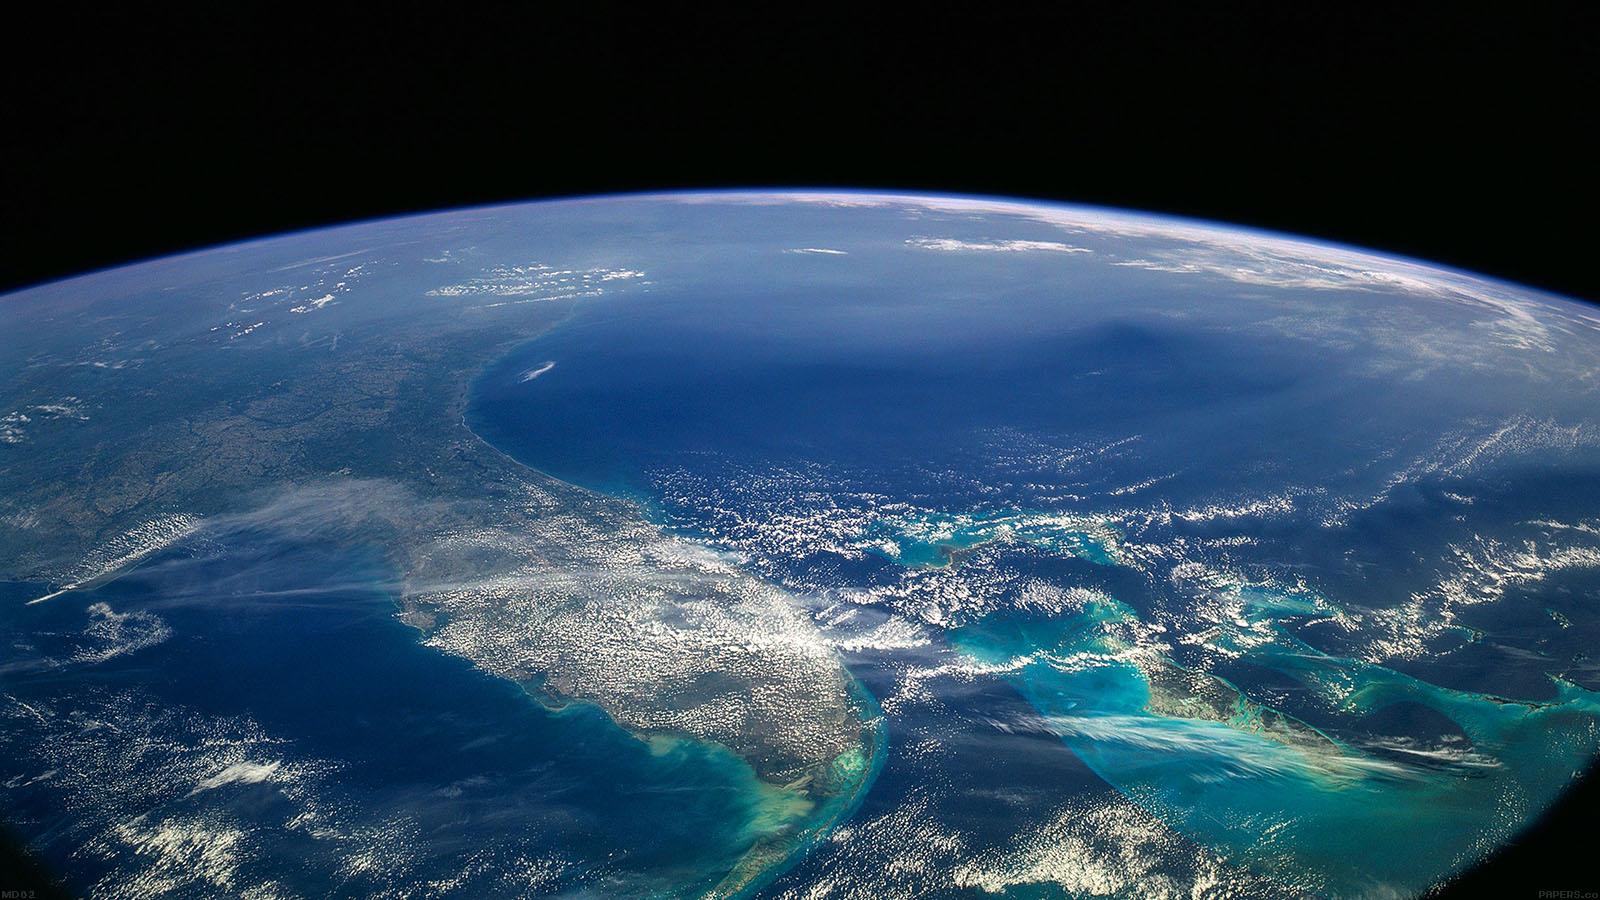 Md02-wallpaper-alien-view-of-earth-space